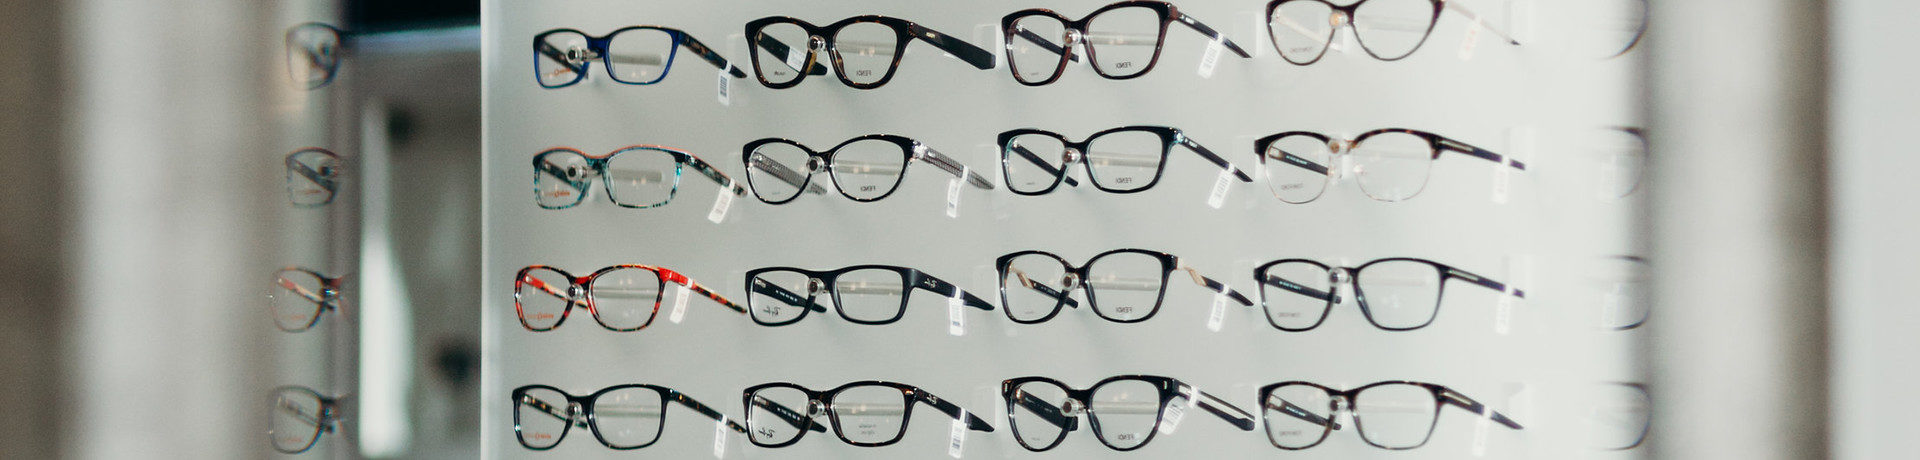 Spectacle Frames | Saskatoon, SK | Pinehouse Eyecare | Pinehouse Eyecare